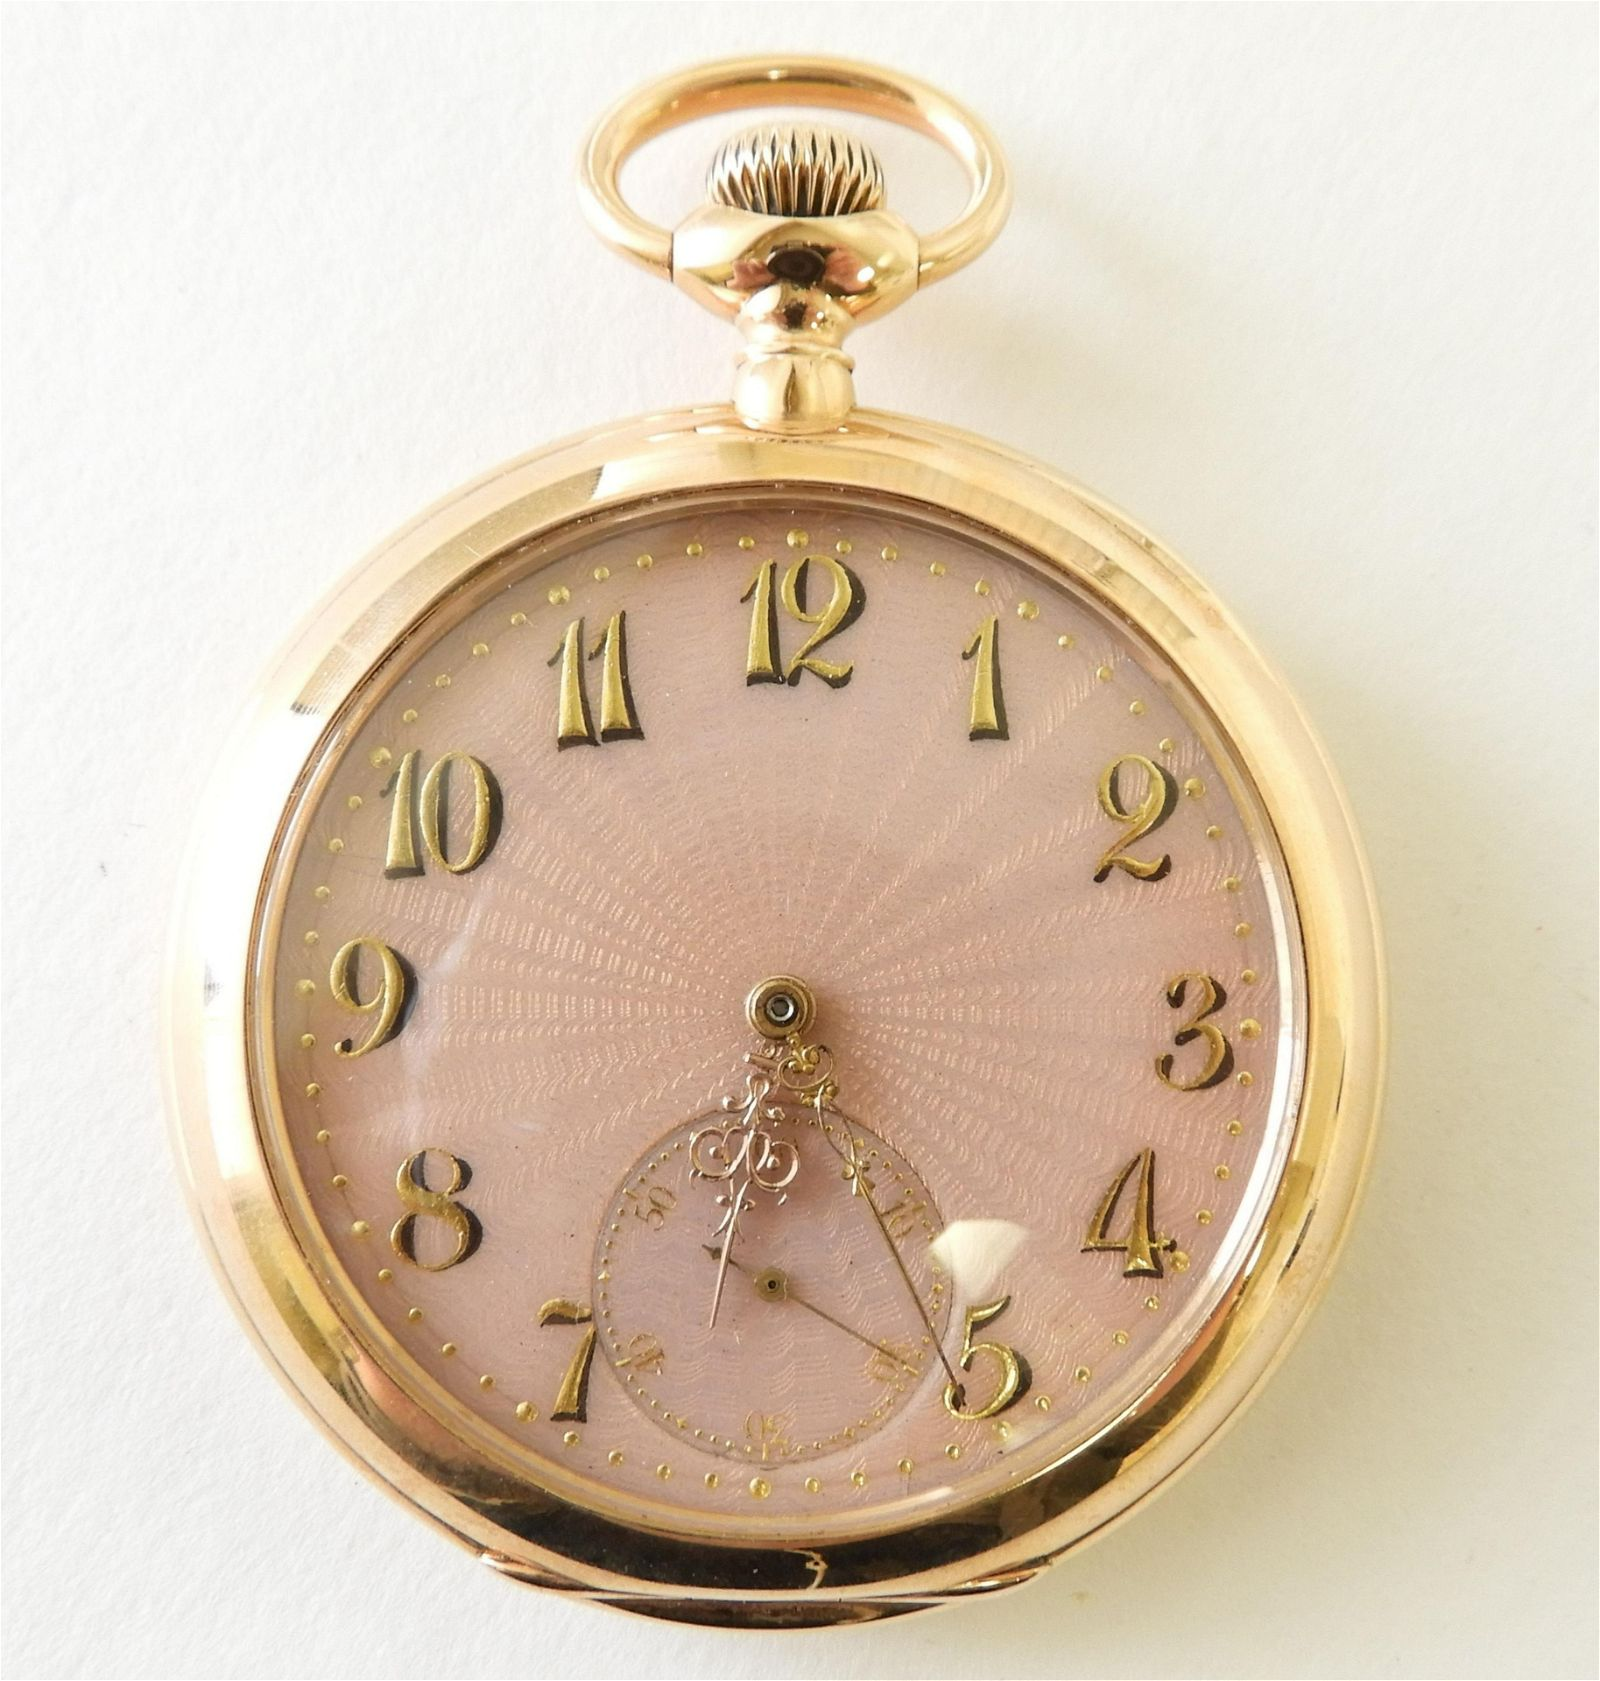 Patek Philippe 18k Rose Gold Pocket Watch